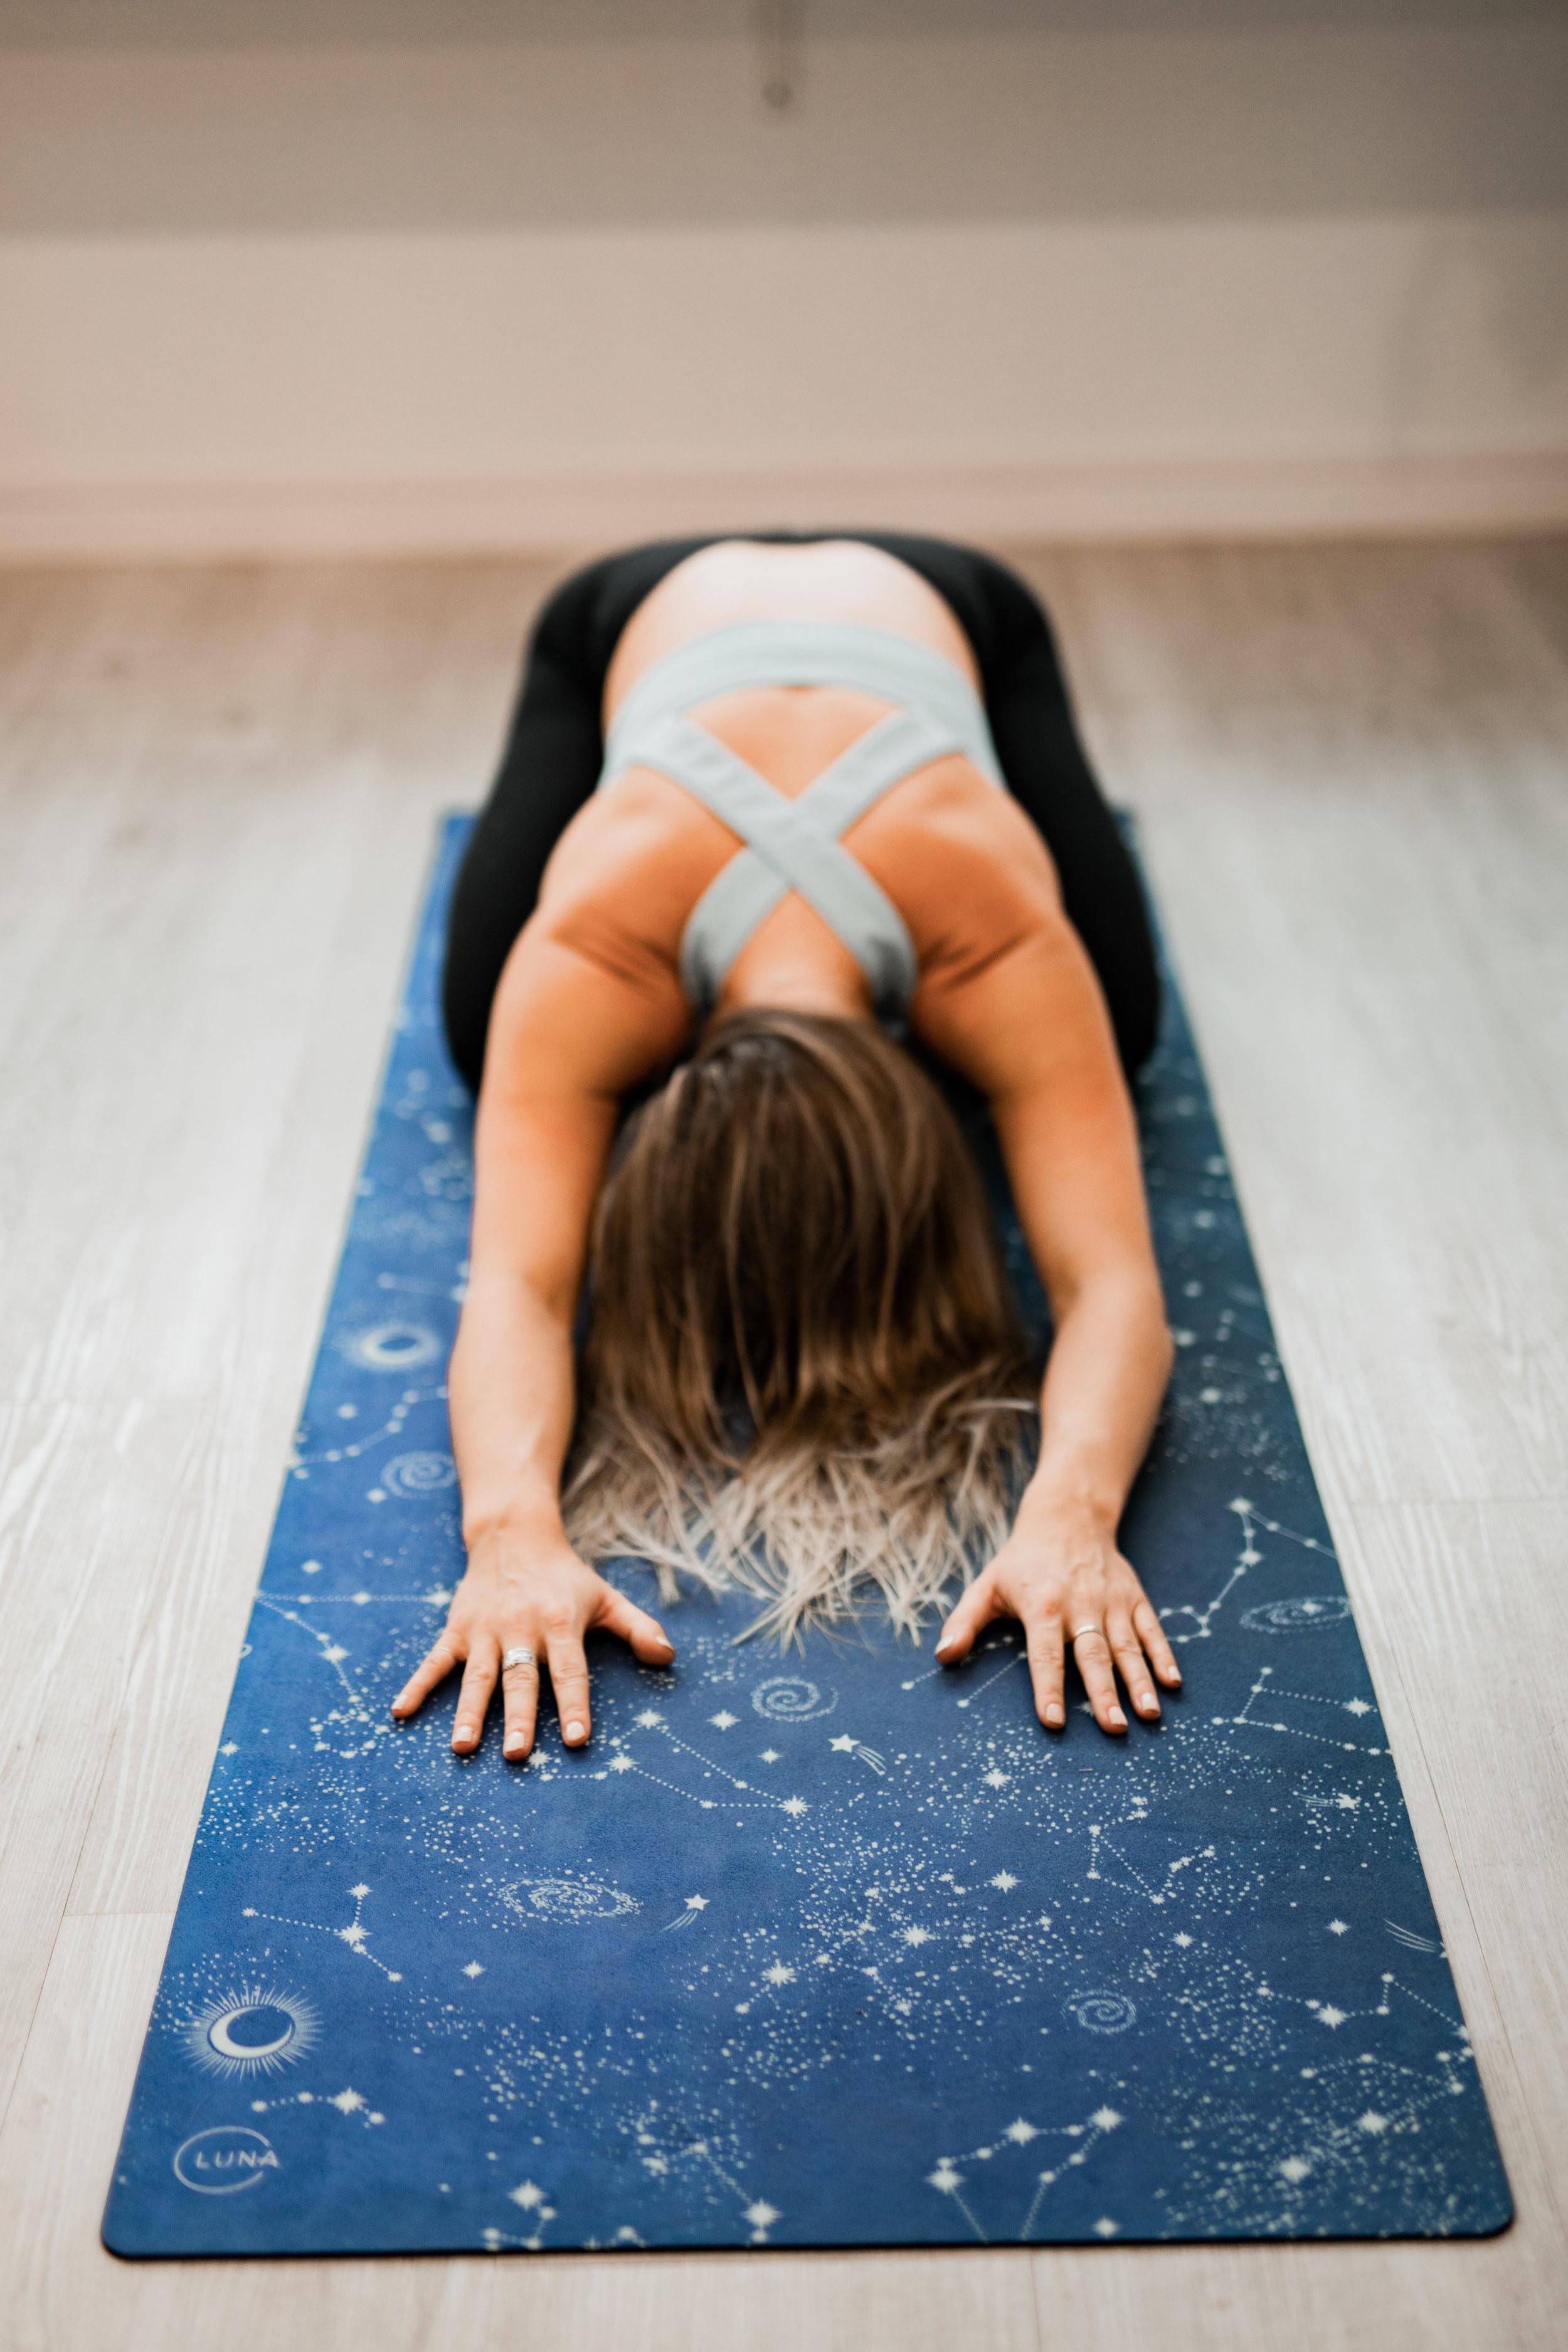 Personal 1-2-1 Yoga Session